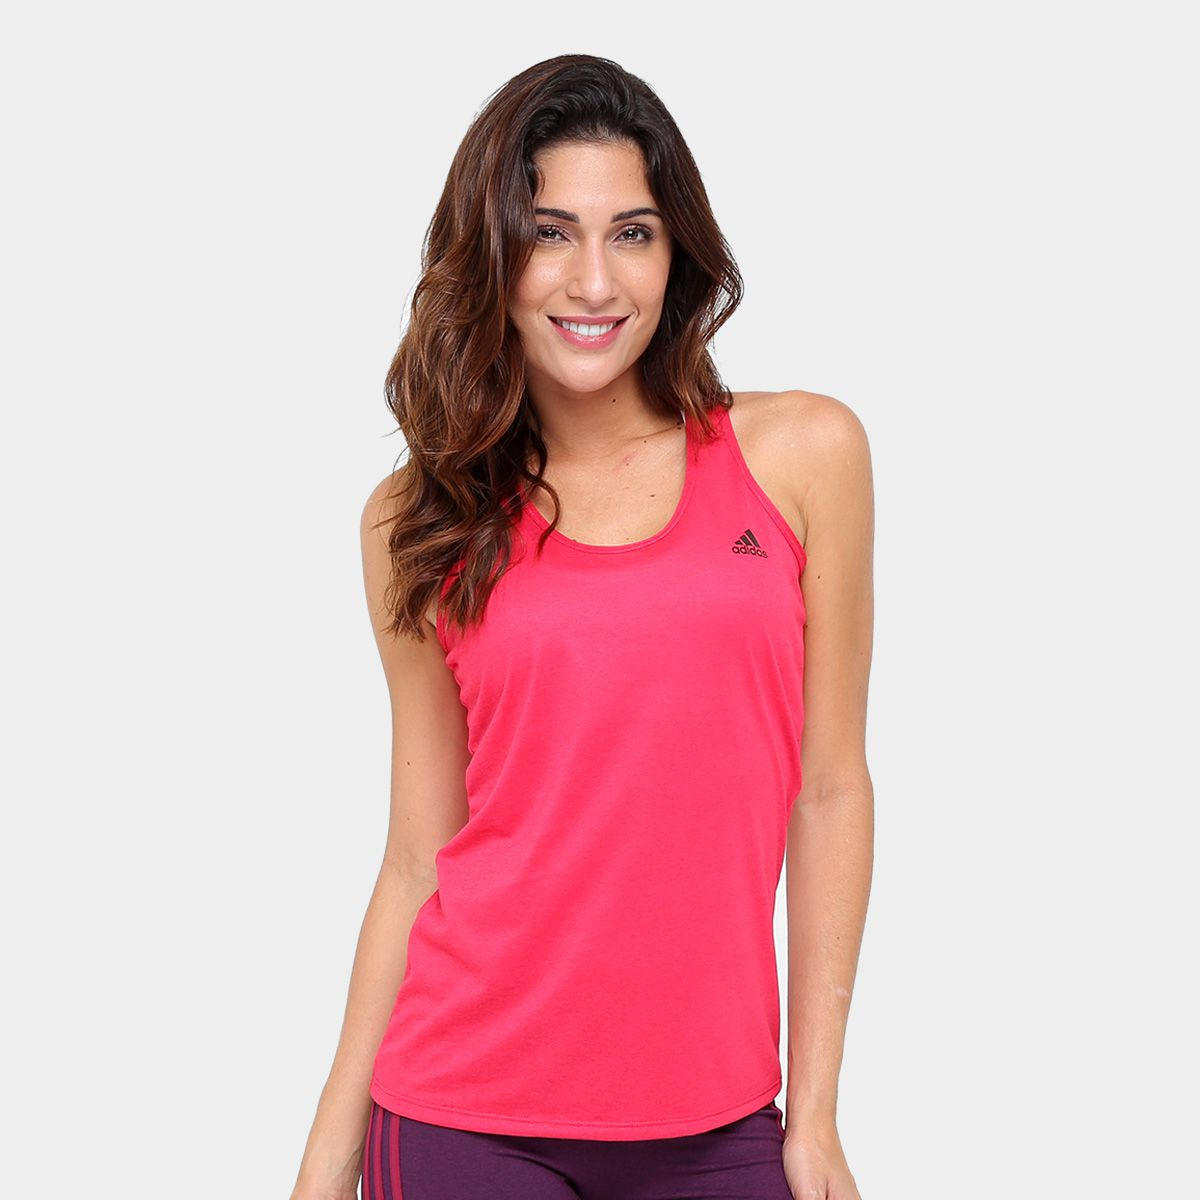 ede82be2ec8fb Camisa Regata Feminina Adidas Fitness - BRACIA SHOP: Loja de Roupas ...